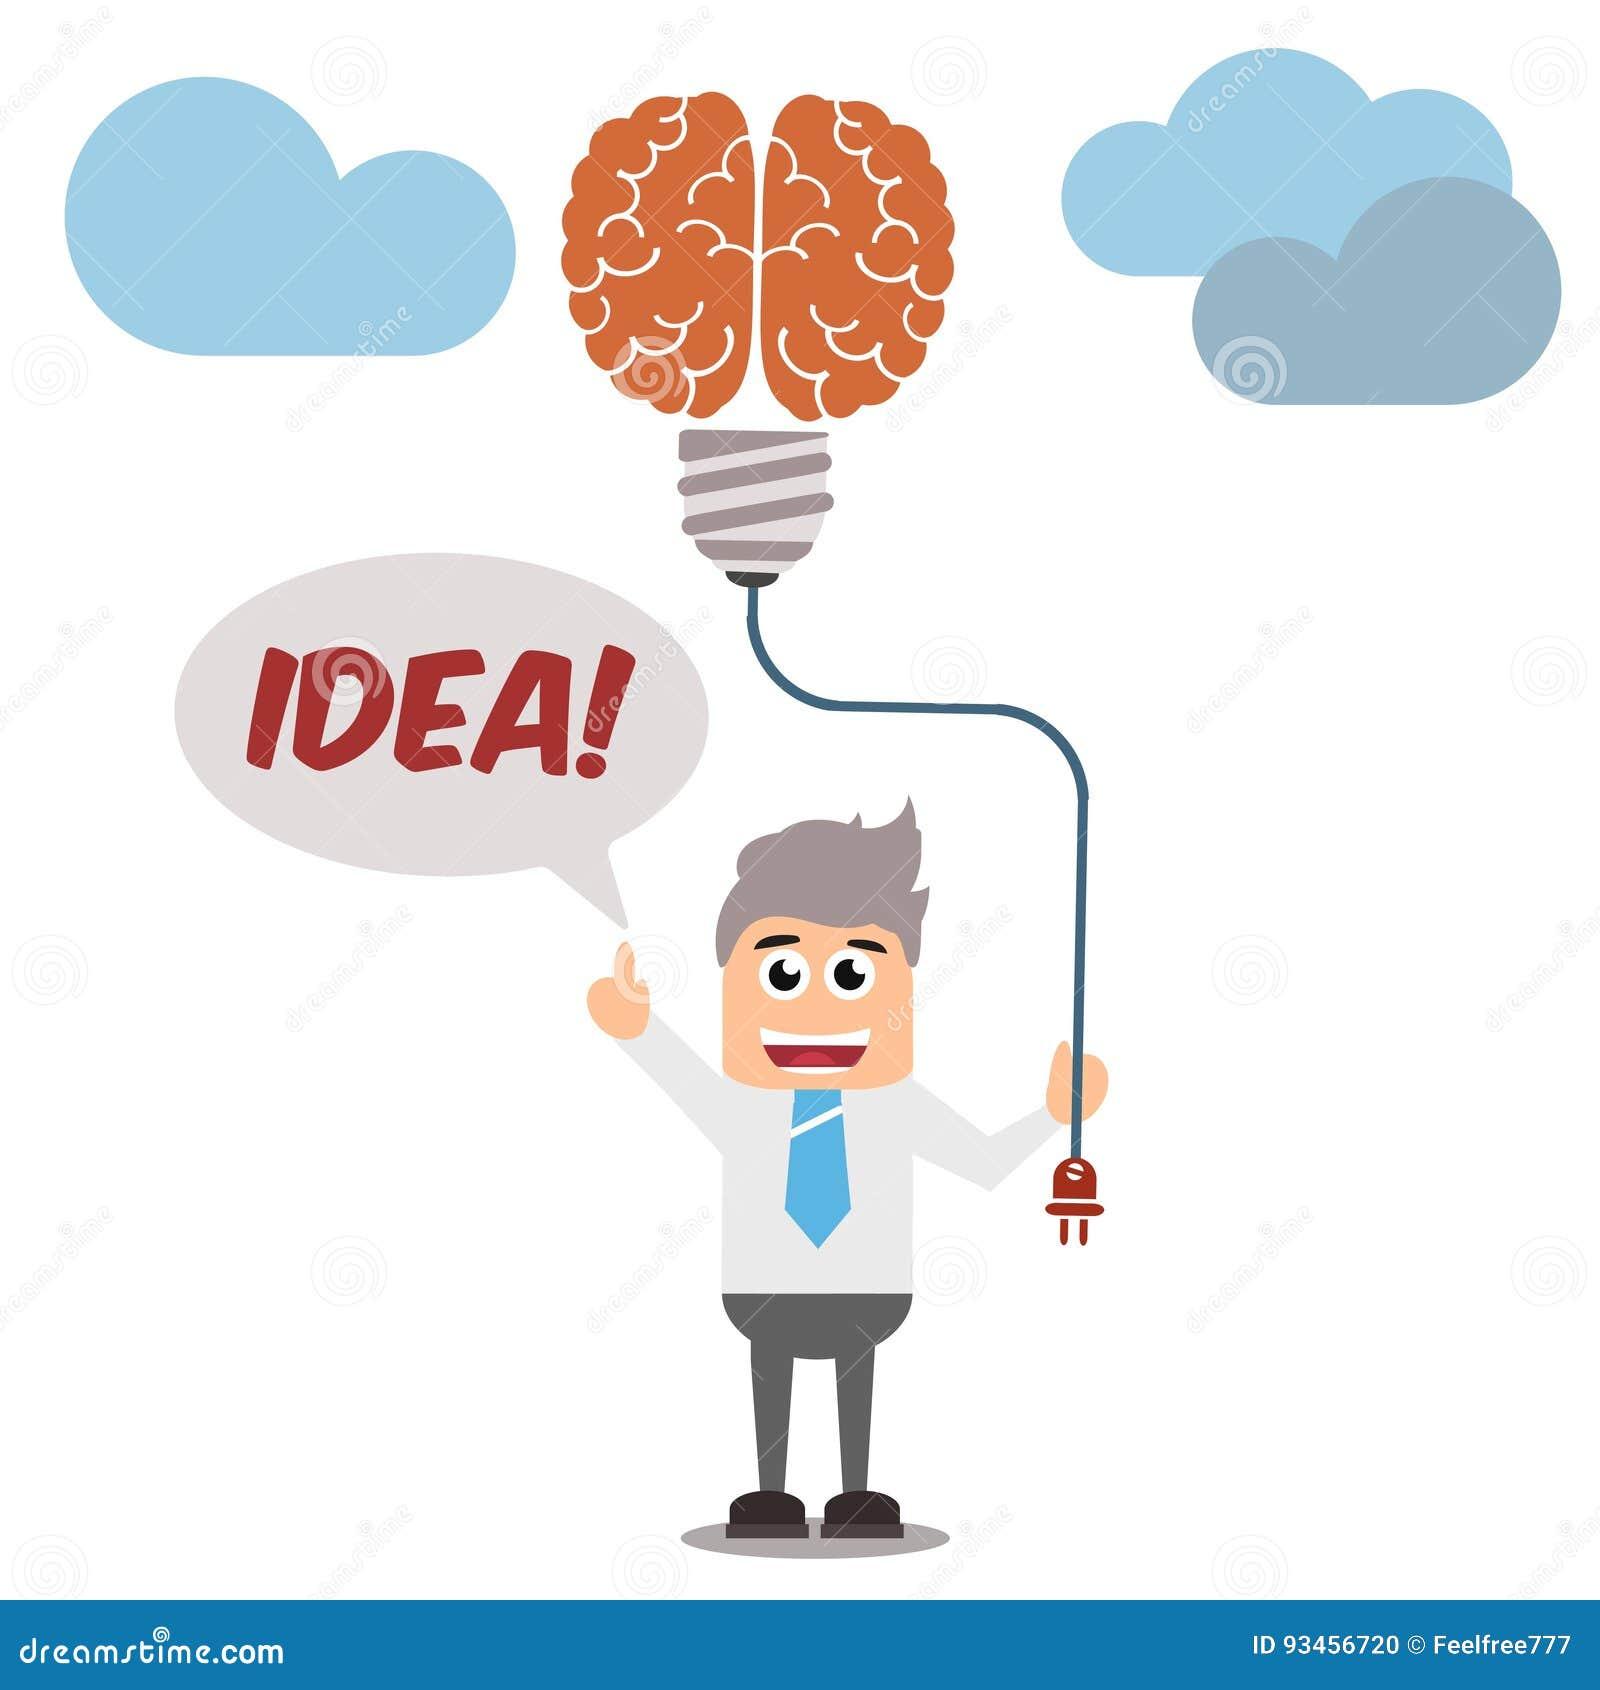 Idea Generator Concept Stock Vector Illustration Of Image